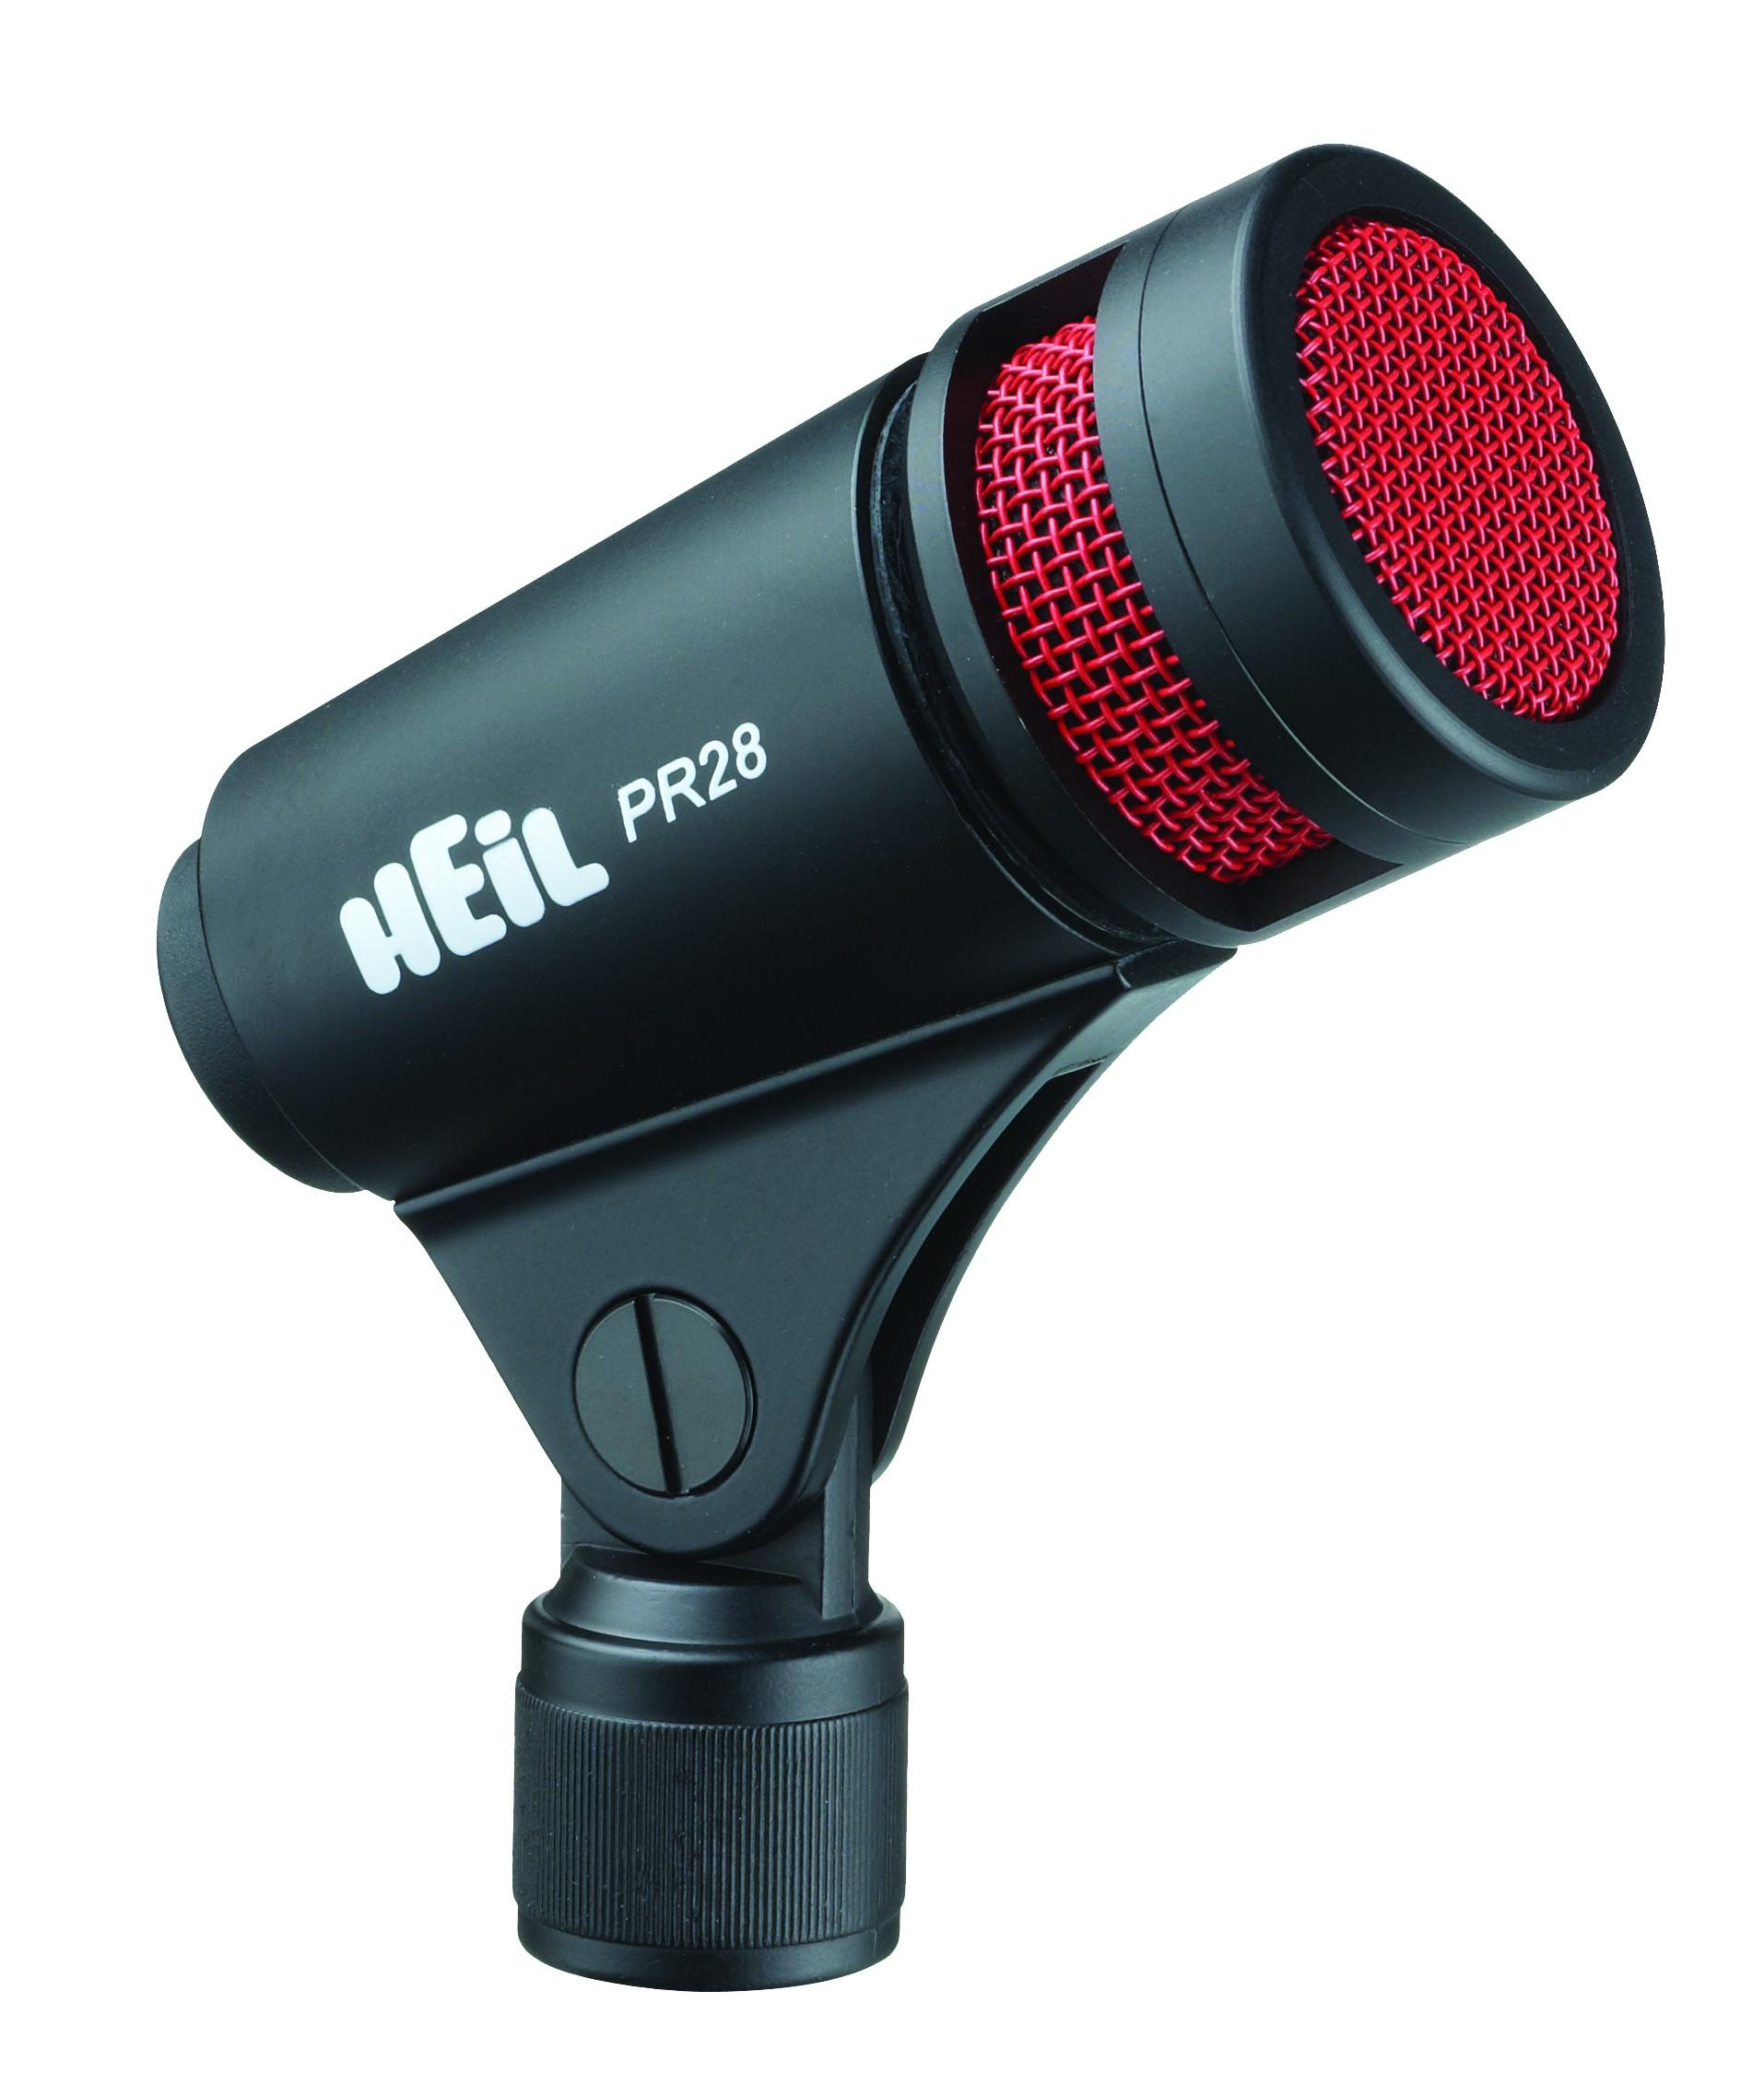 PR-28 Tom Microphone